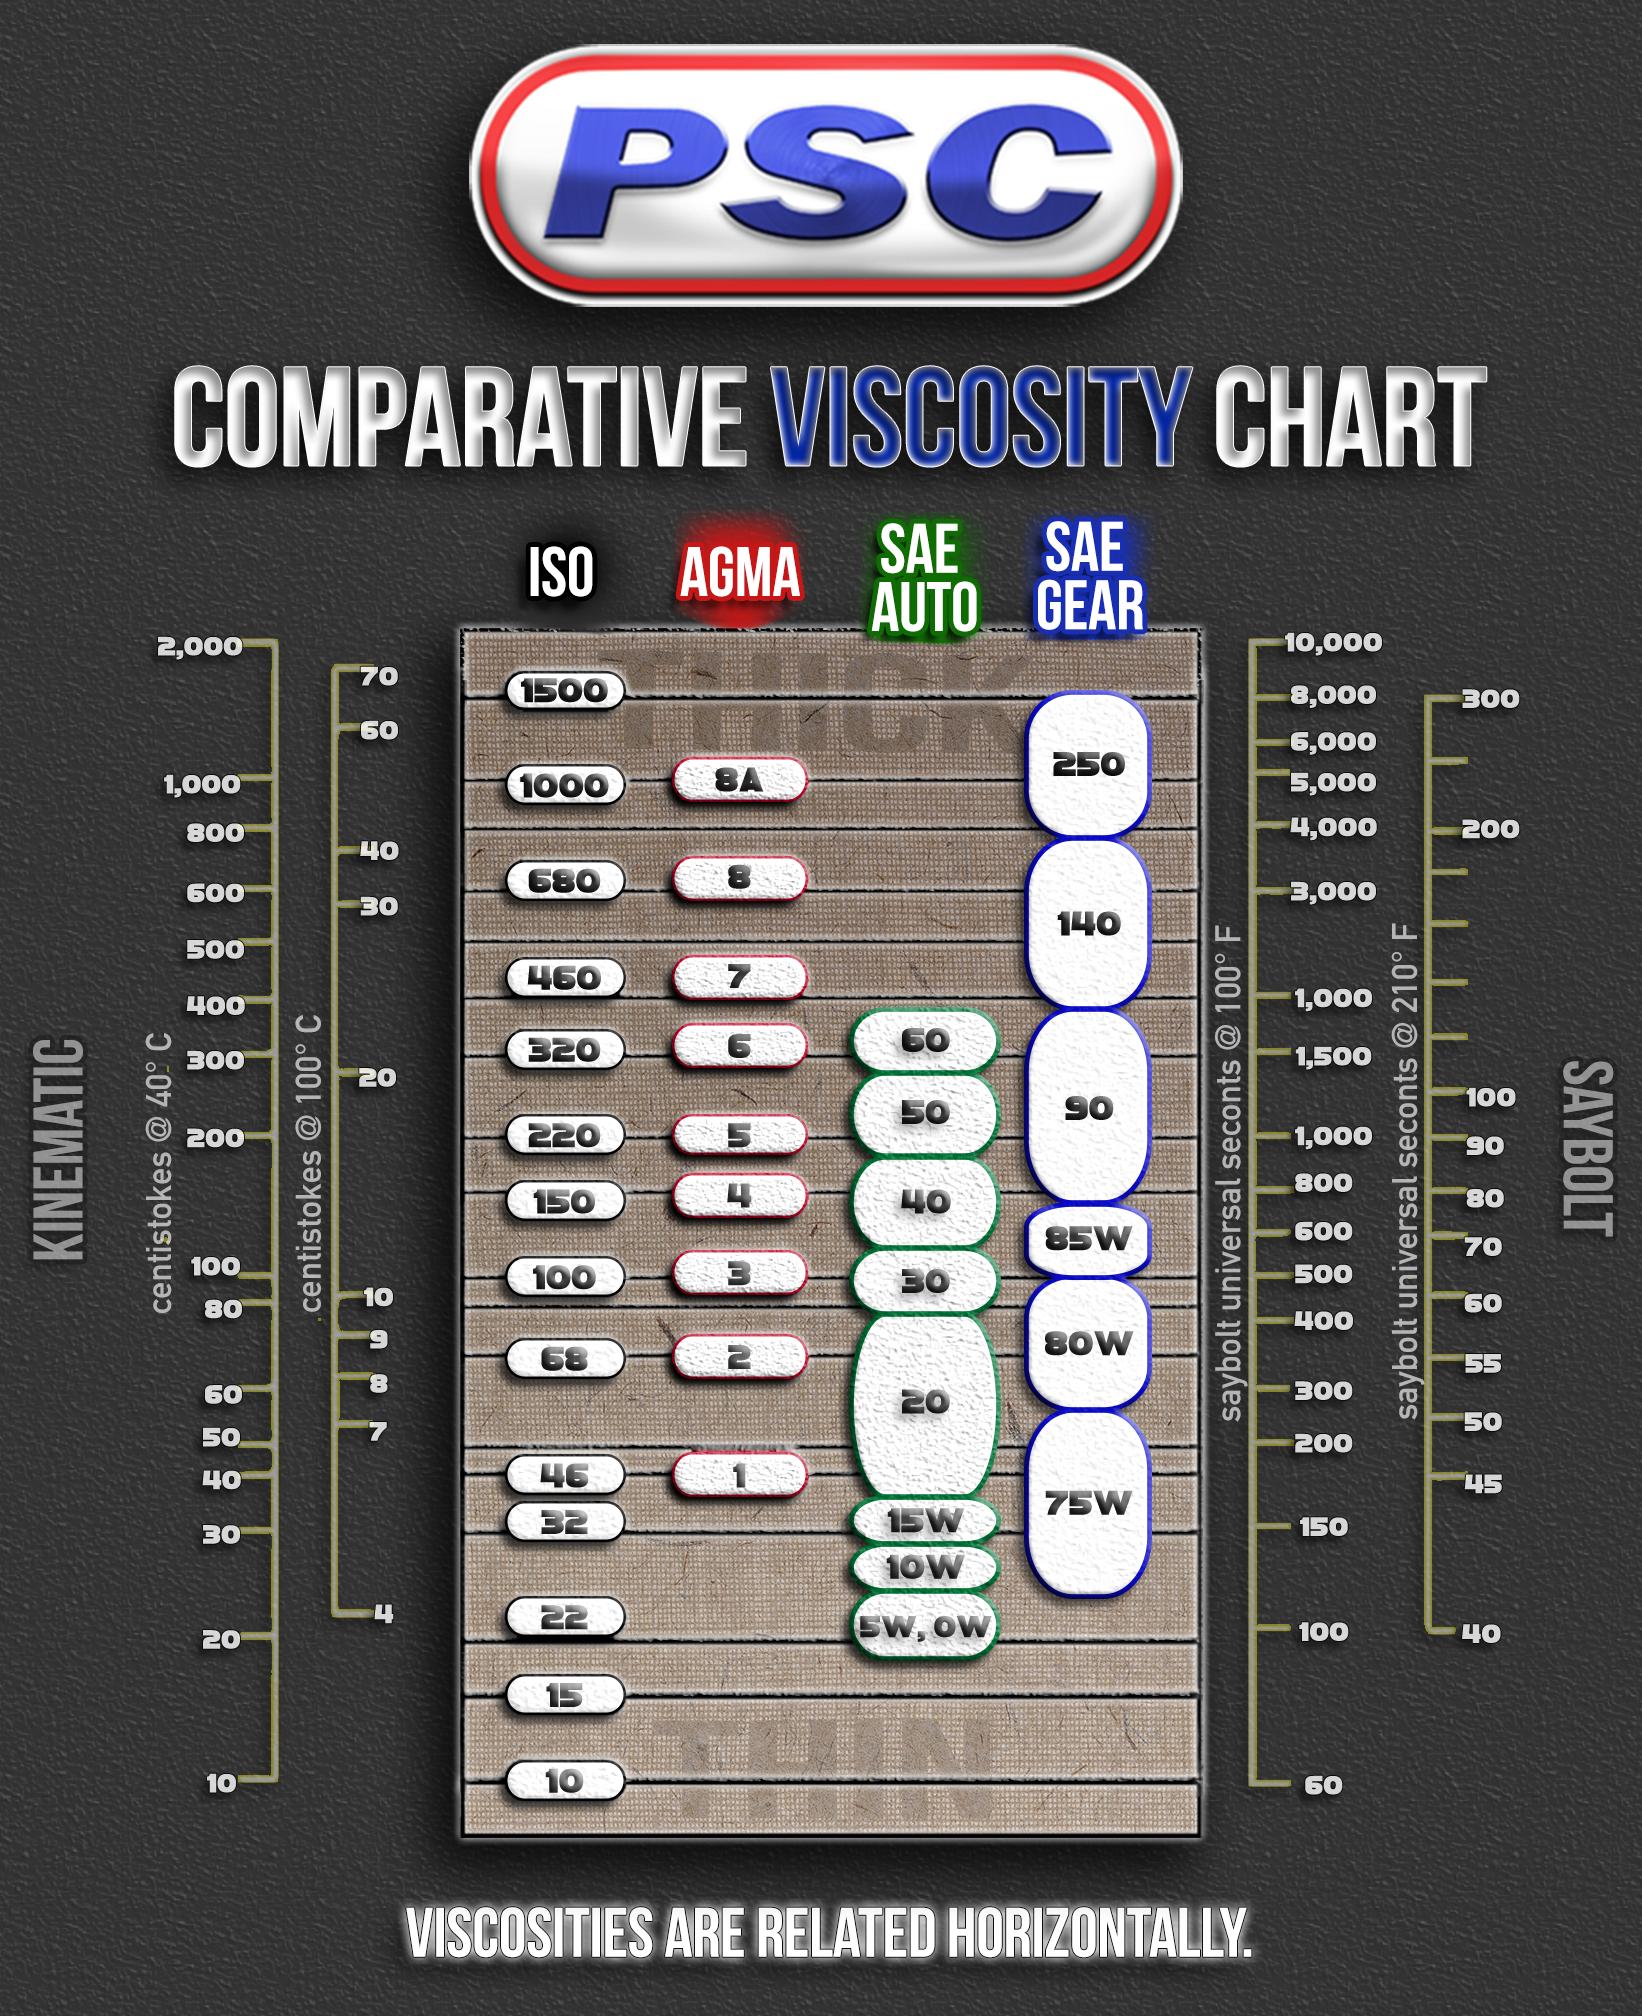 Compare oil viscosity for ISO VG, AGMA, SAE Auto, SAE Gear